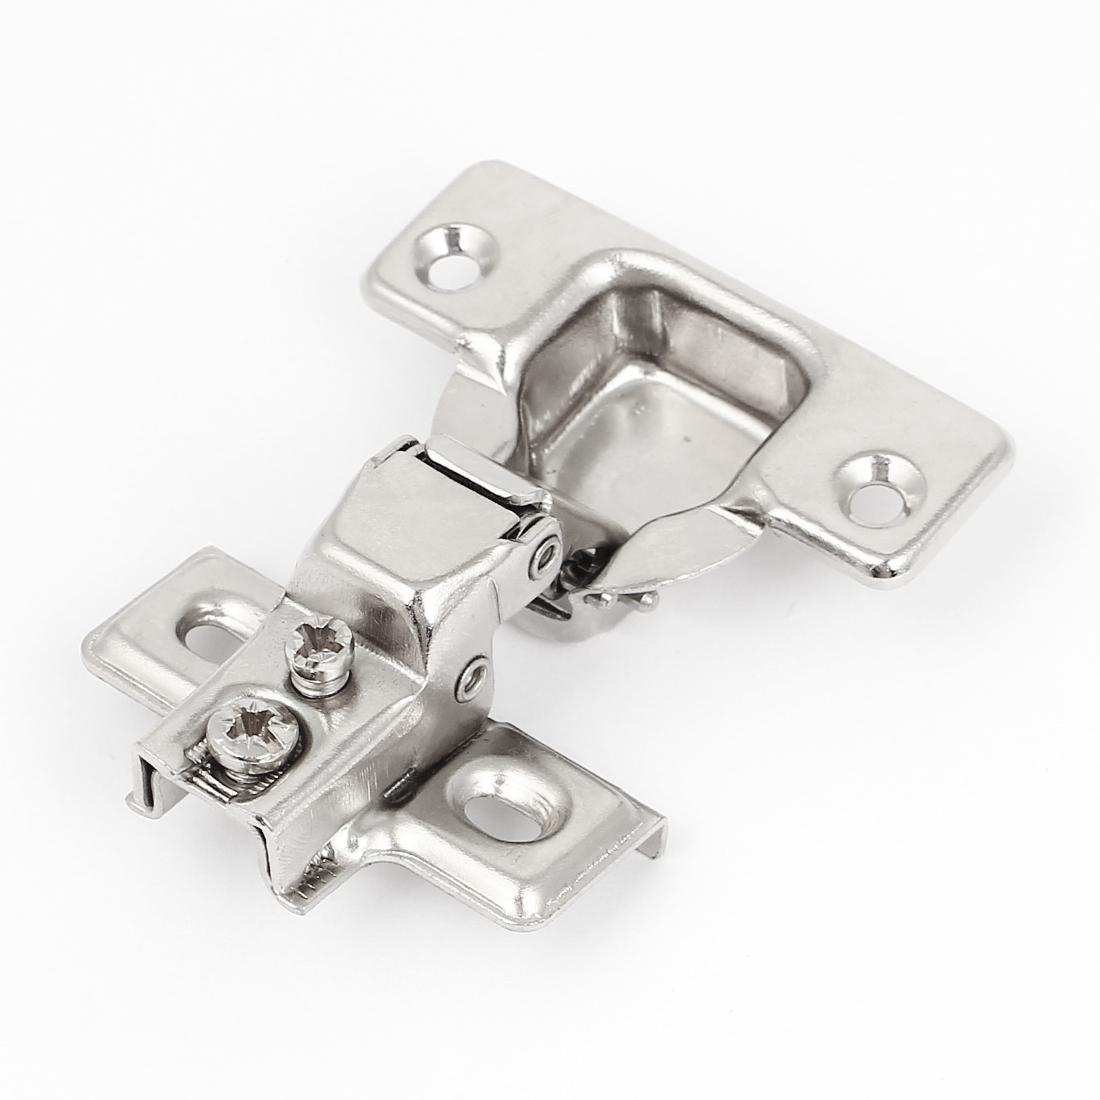 Cabinet Hydraulic Soft Close Half Overlay Concealed Inset Hinge Hardware